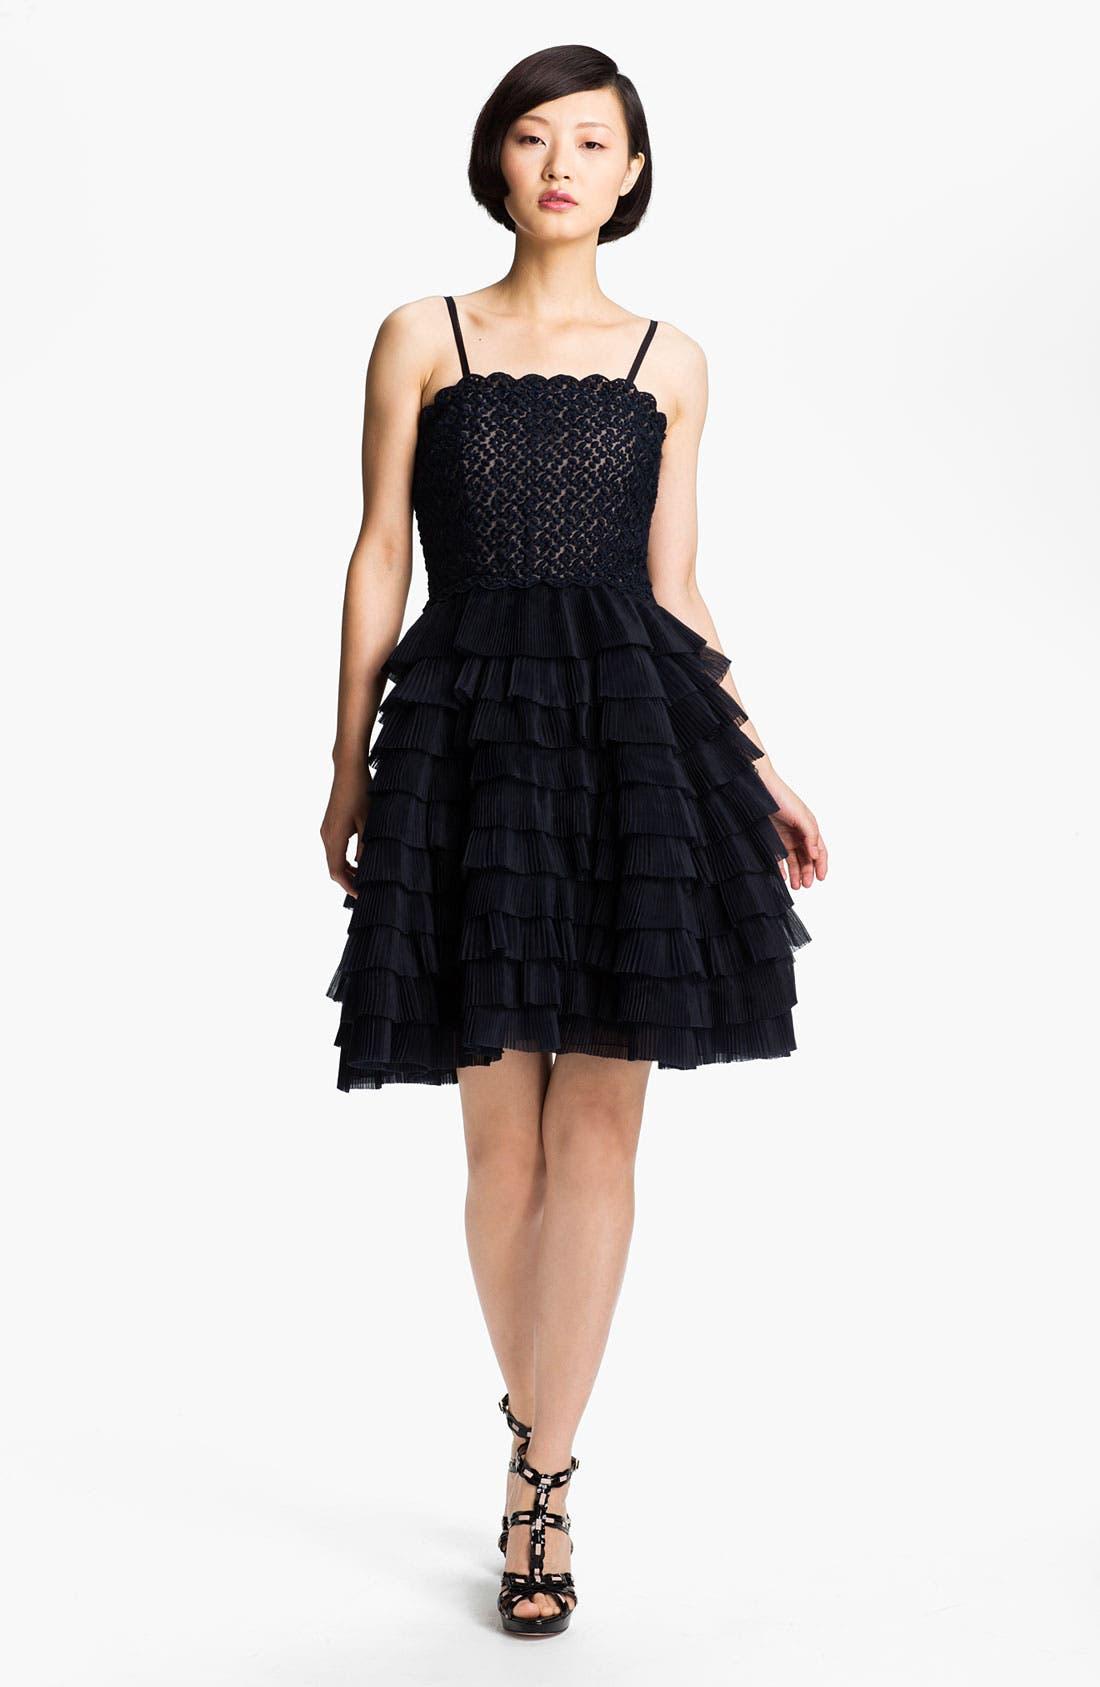 Main Image - RED Valentino Full Skirt Organza Dress